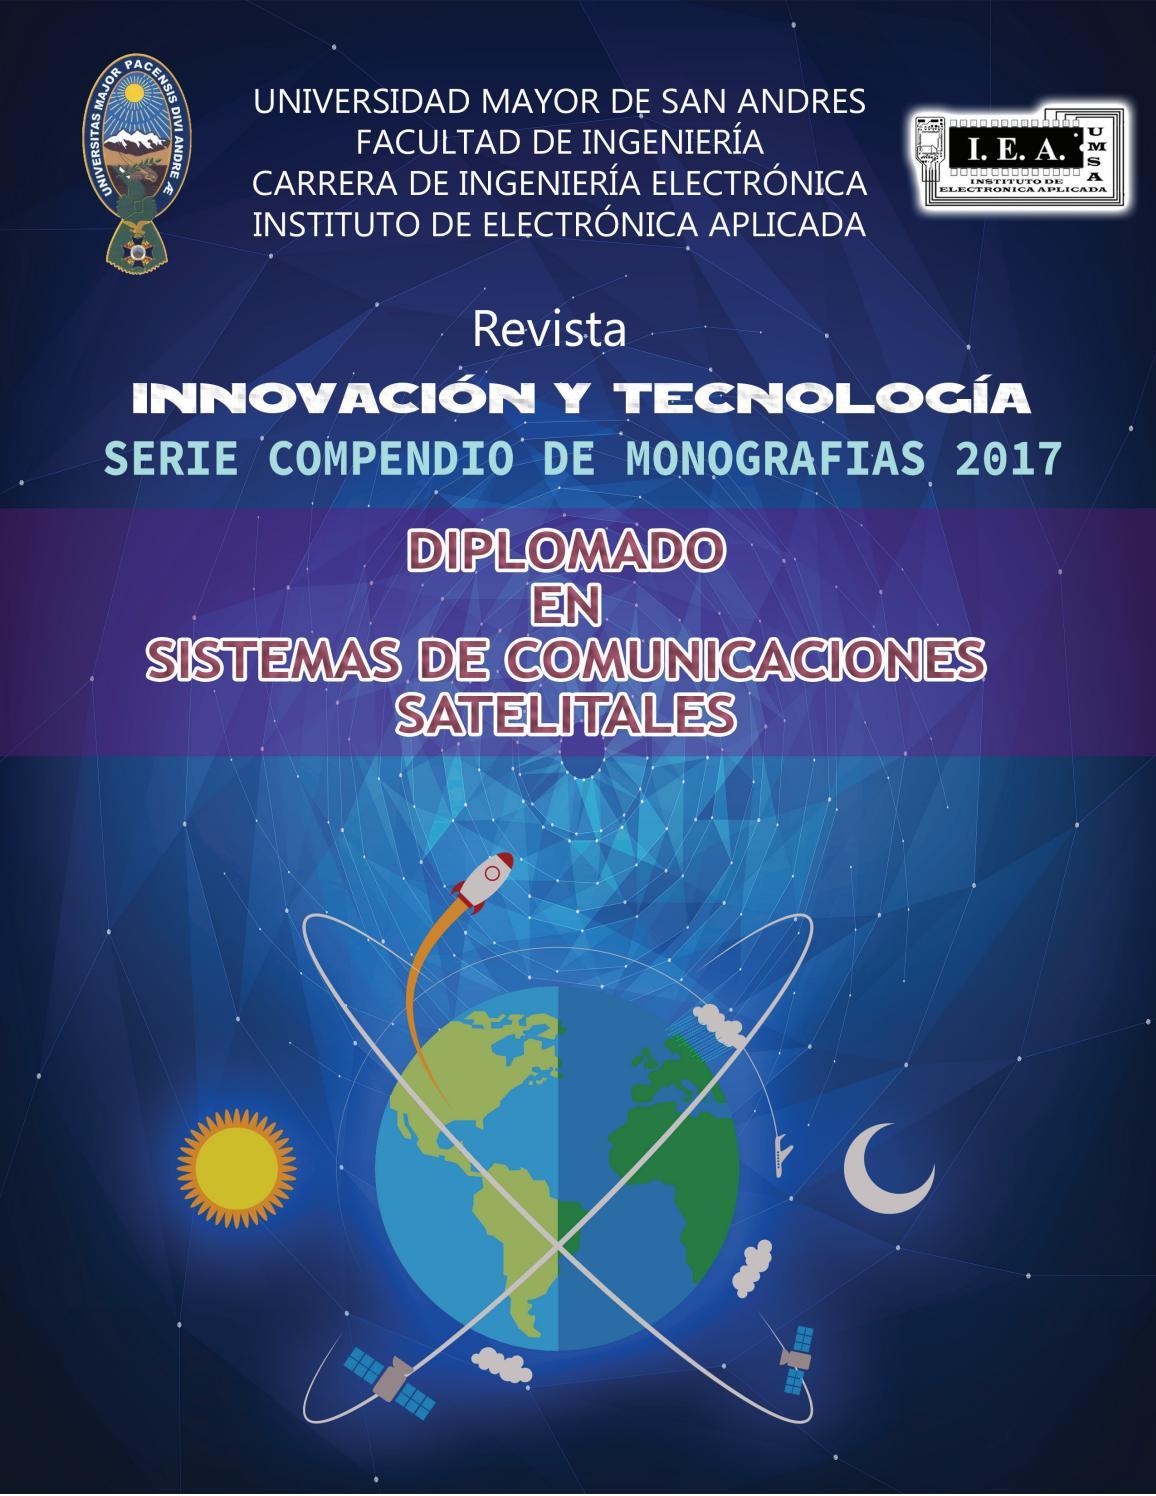 Revista compendio 2017 by IEA UMSA - issuu